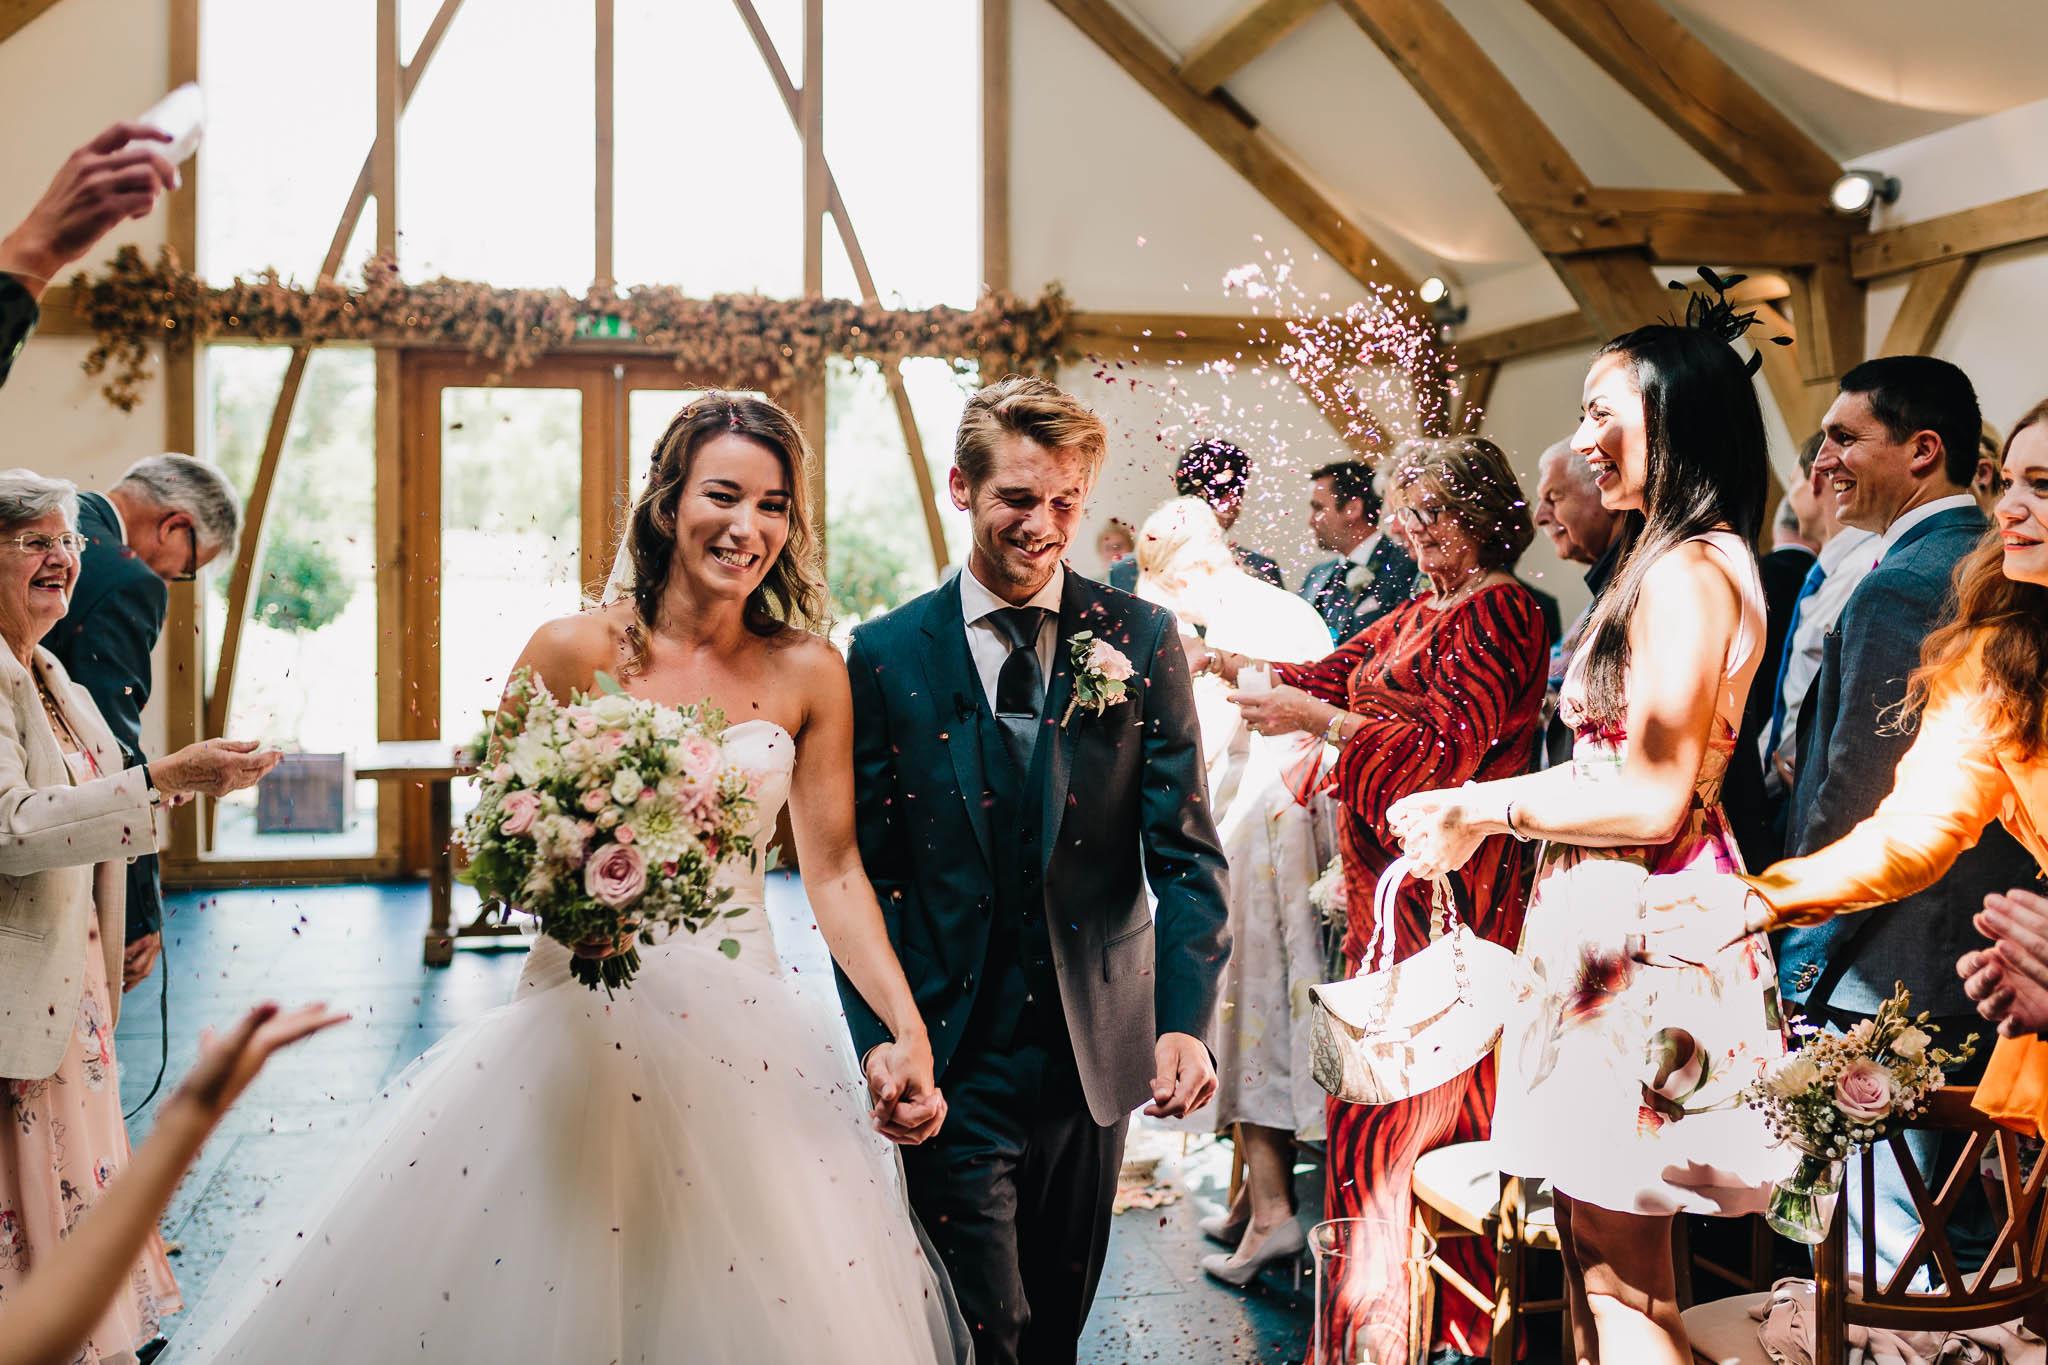 BRIDE AND GROOM CONFETTI WALK AFTER WEDDING